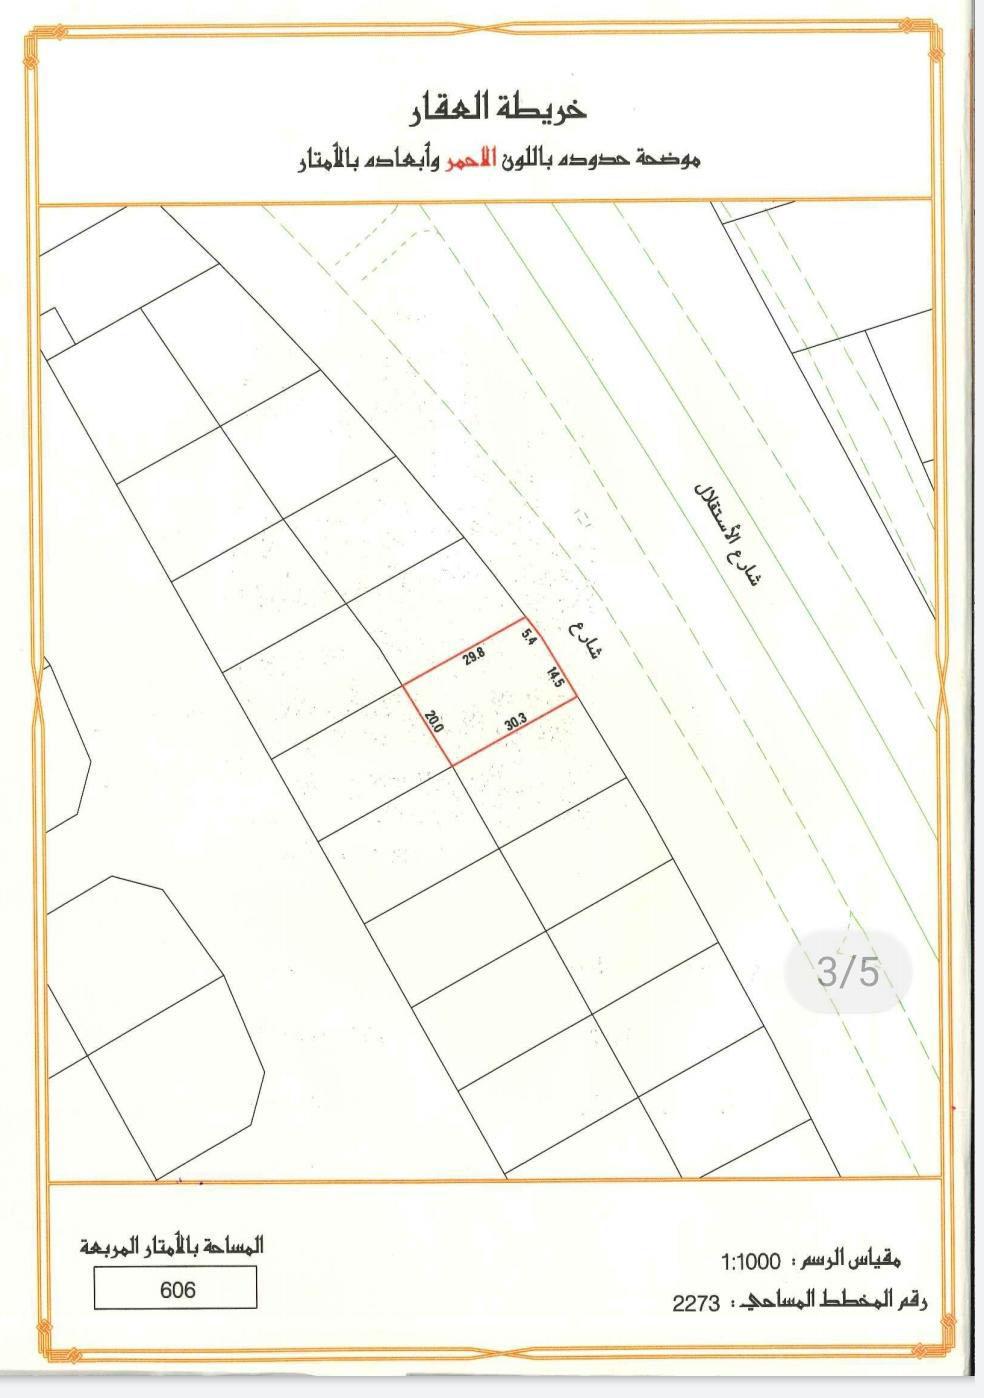 For Sale Land In Al Hajiyat. Ref: HAJ-SB-003